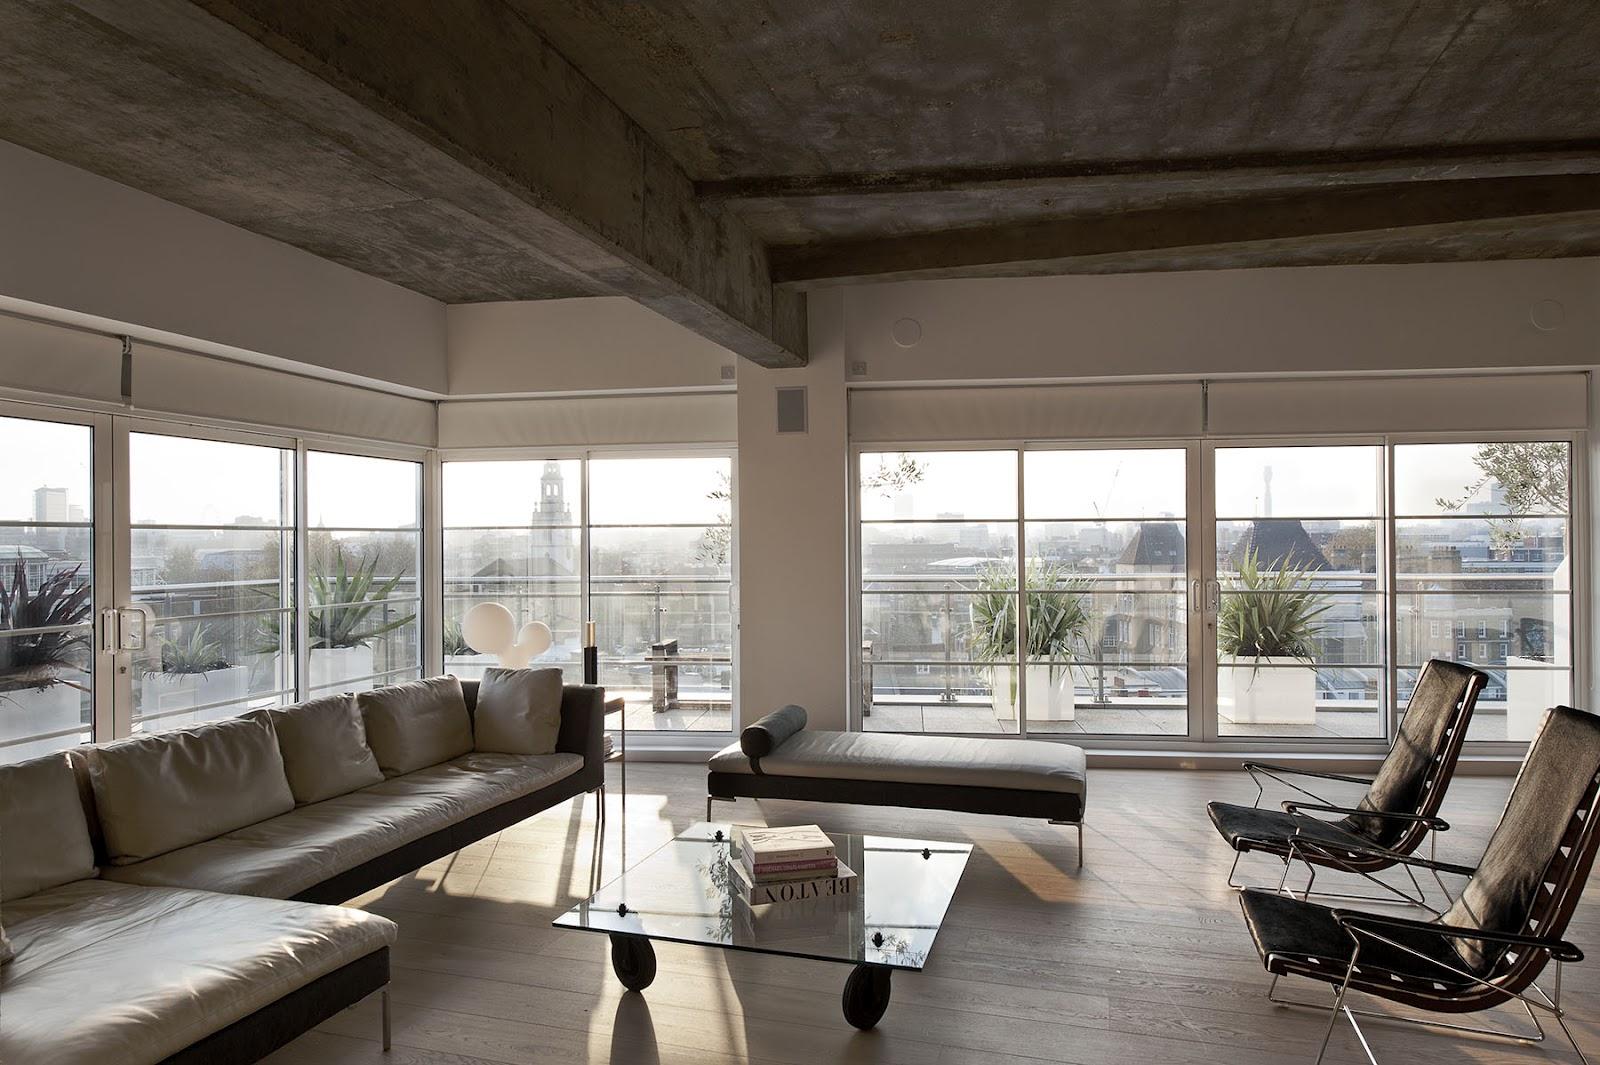 New Home Design: Outtakes: William Tozer's London loft